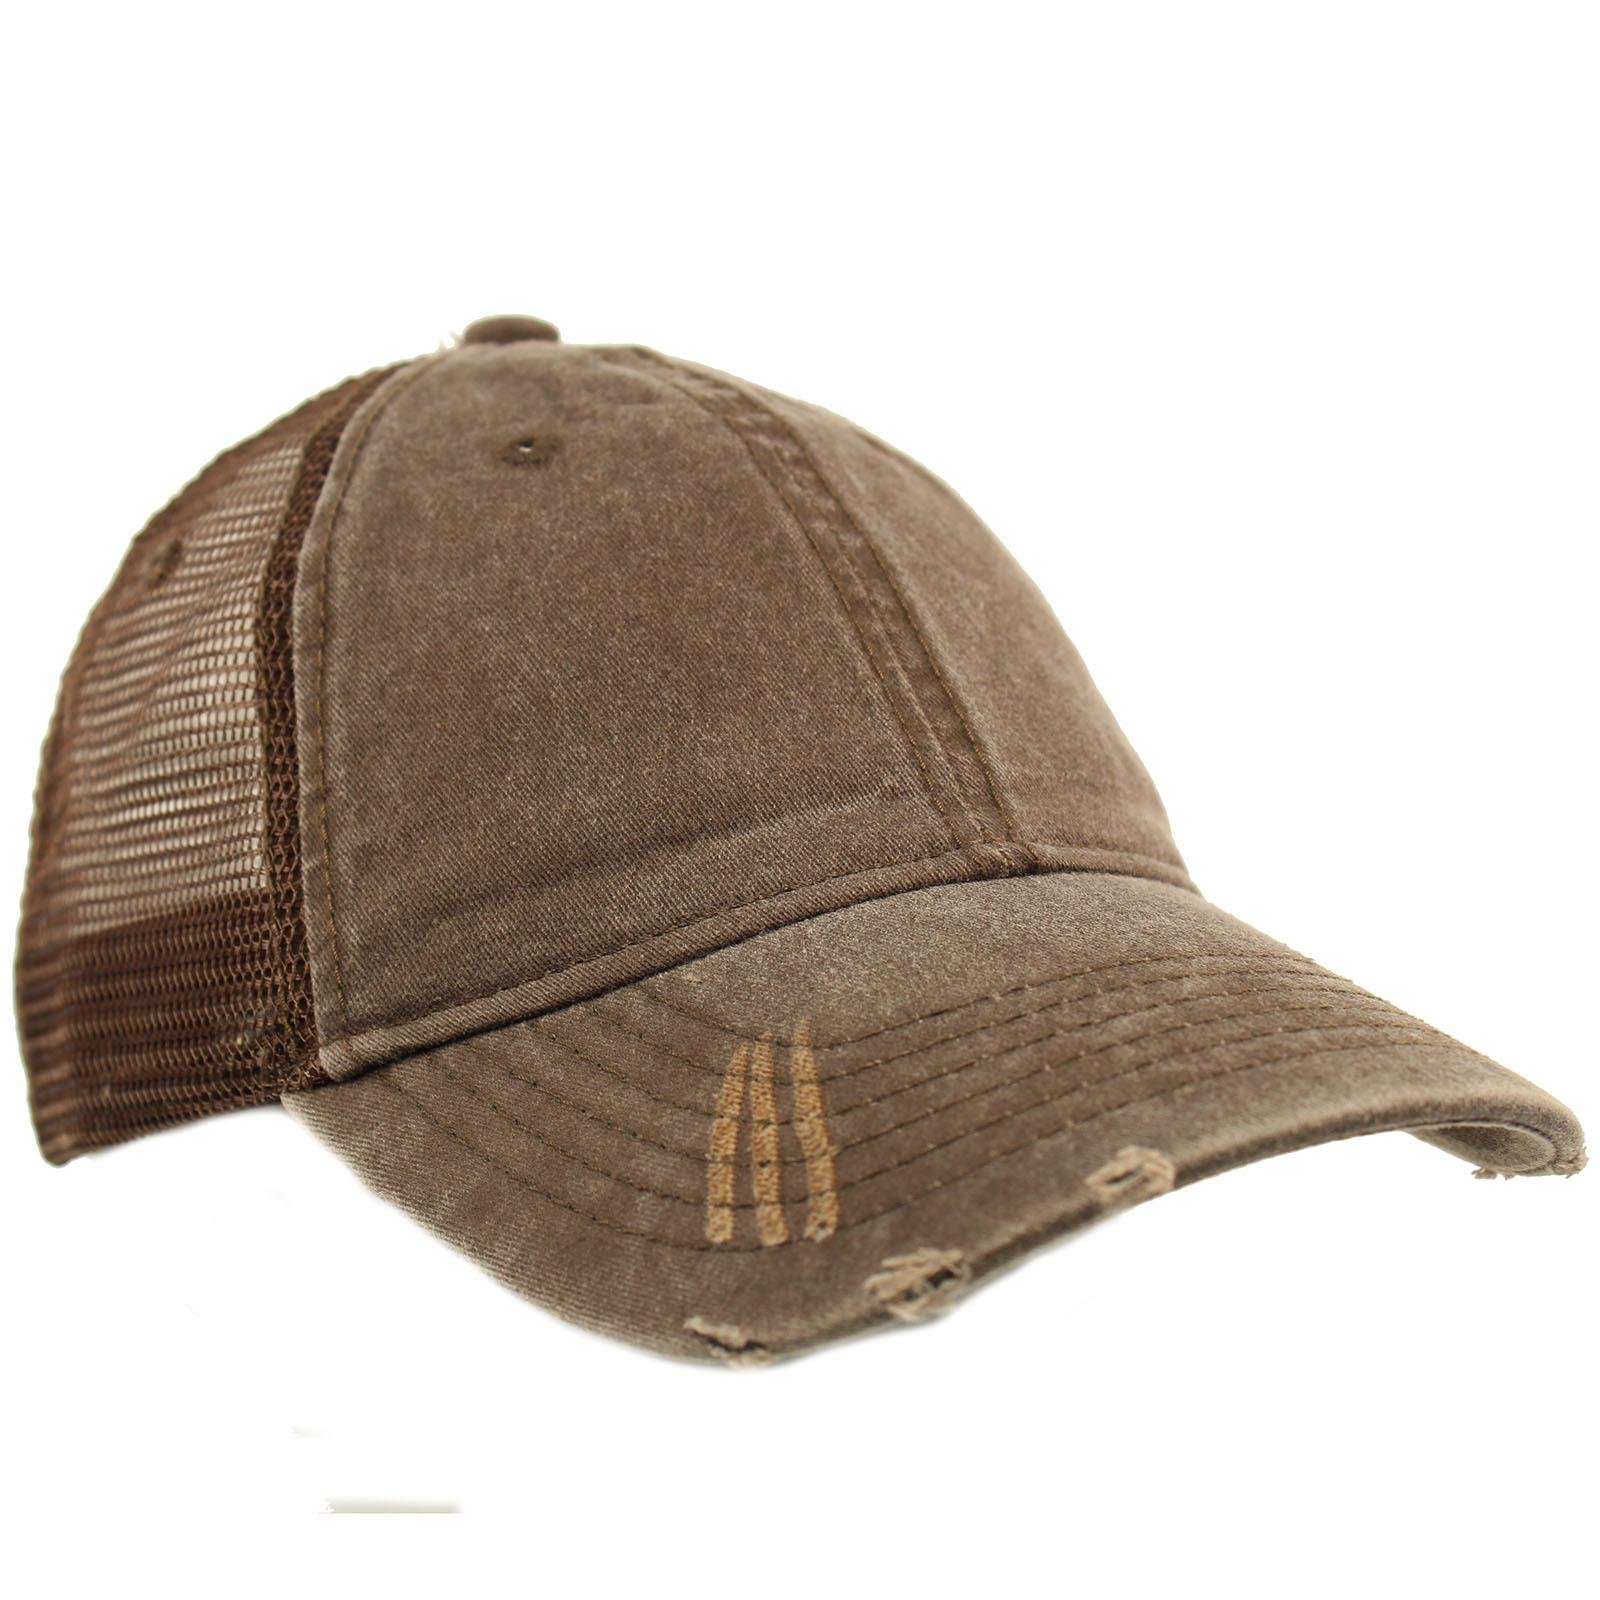 Unisex Distressed Low Profile Trucker Mesh Summer Baseball Sun Cap Hat Brown